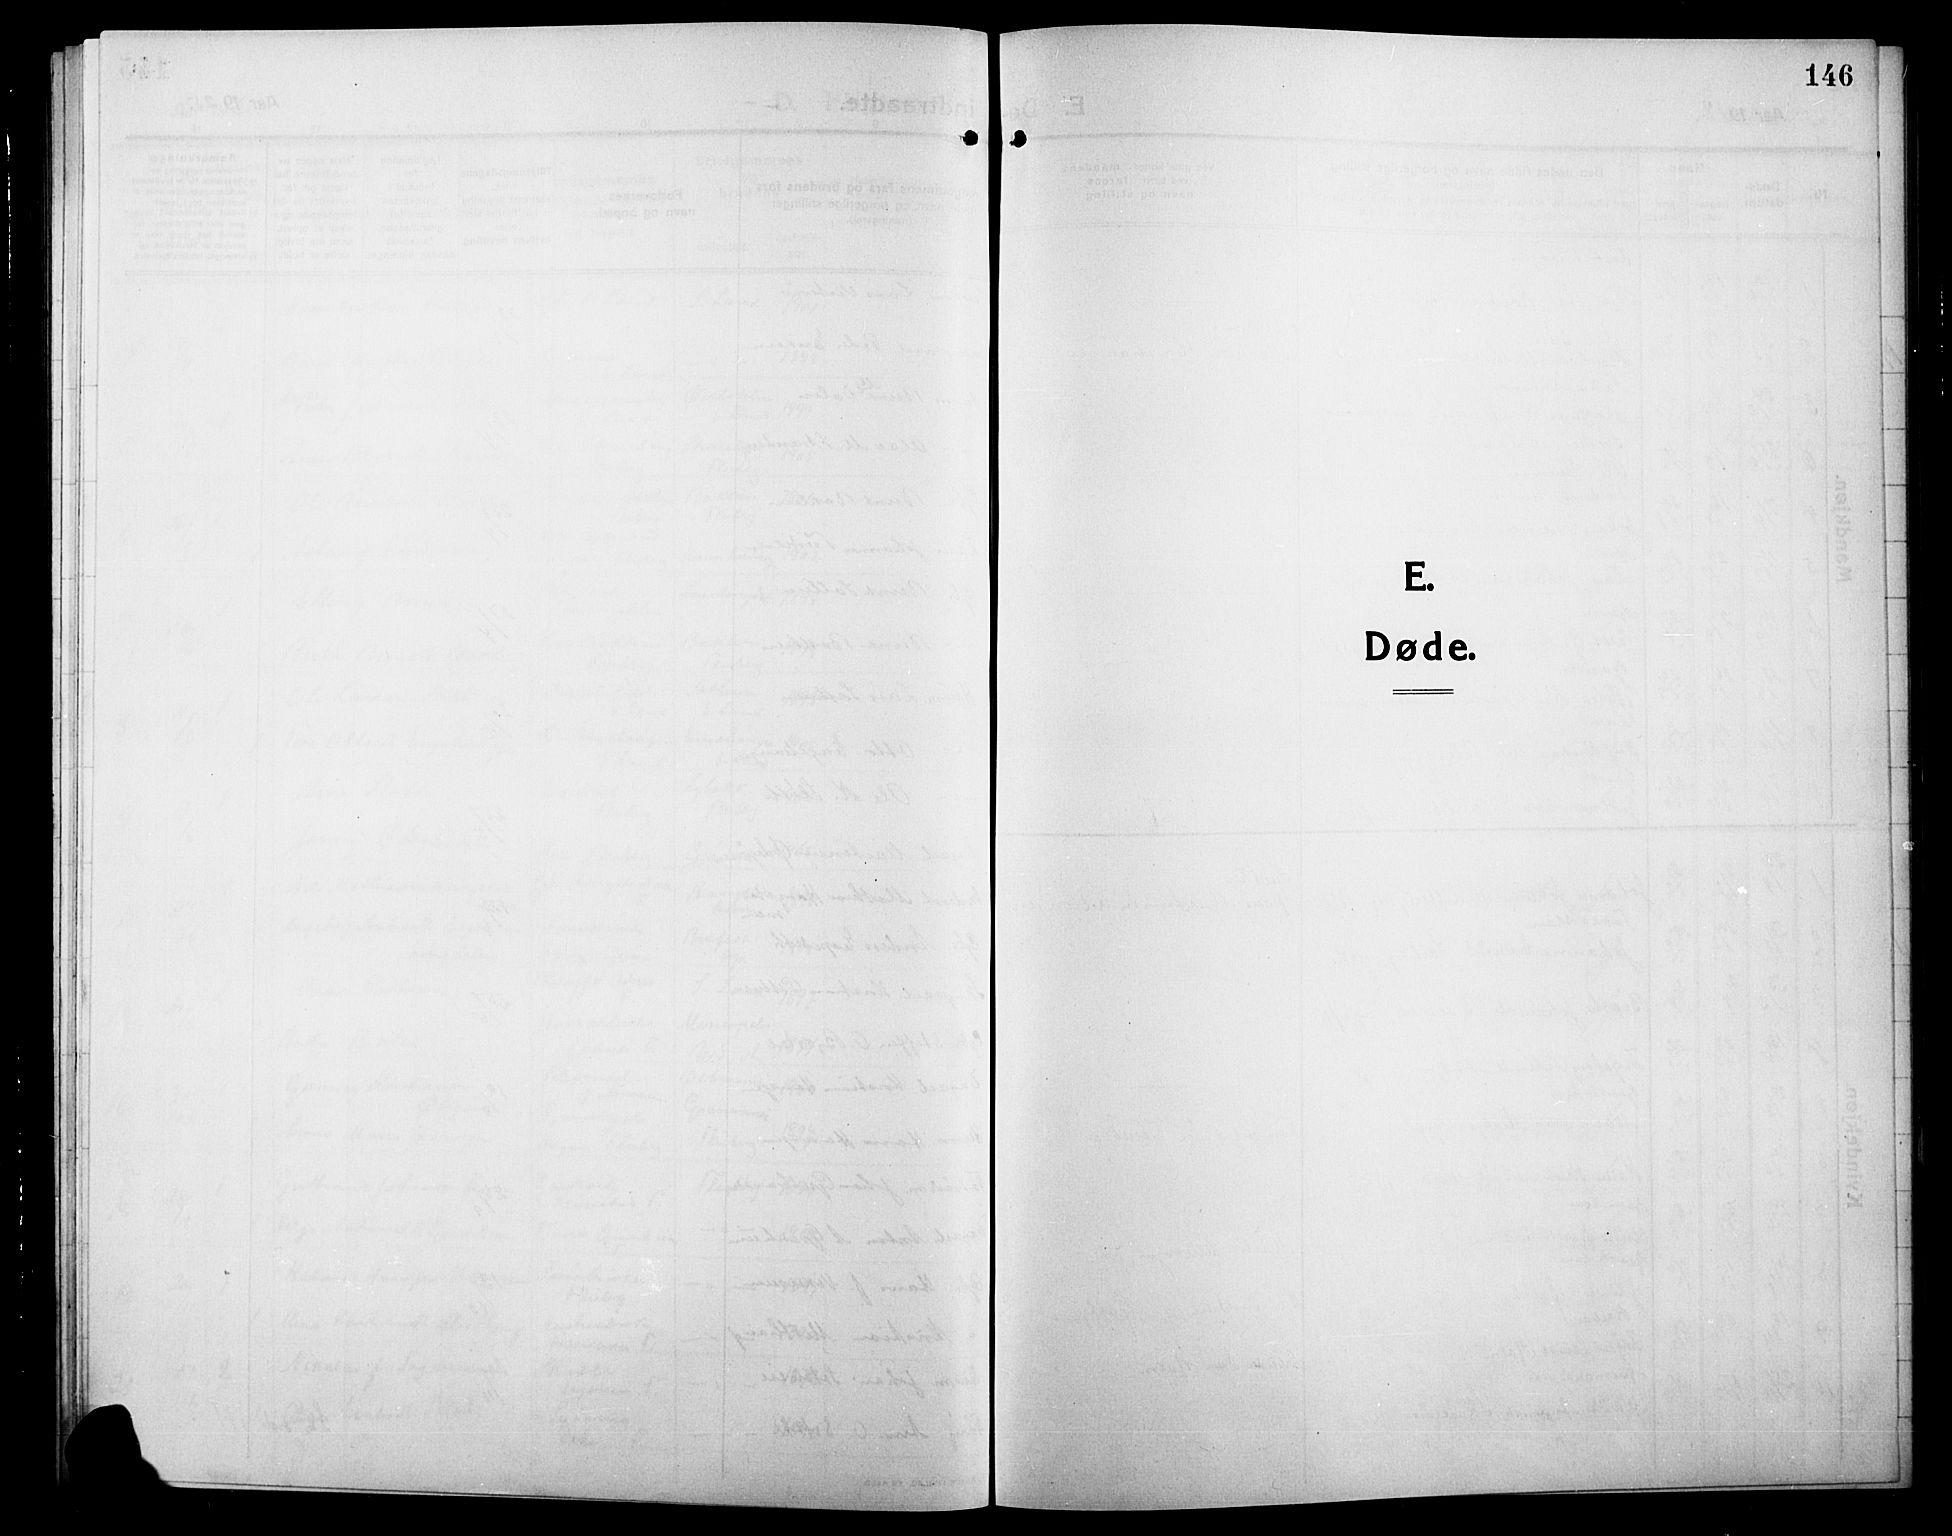 SAH, Søndre Land prestekontor, L/L0006: Klokkerbok nr. 6, 1912-1925, s. 146